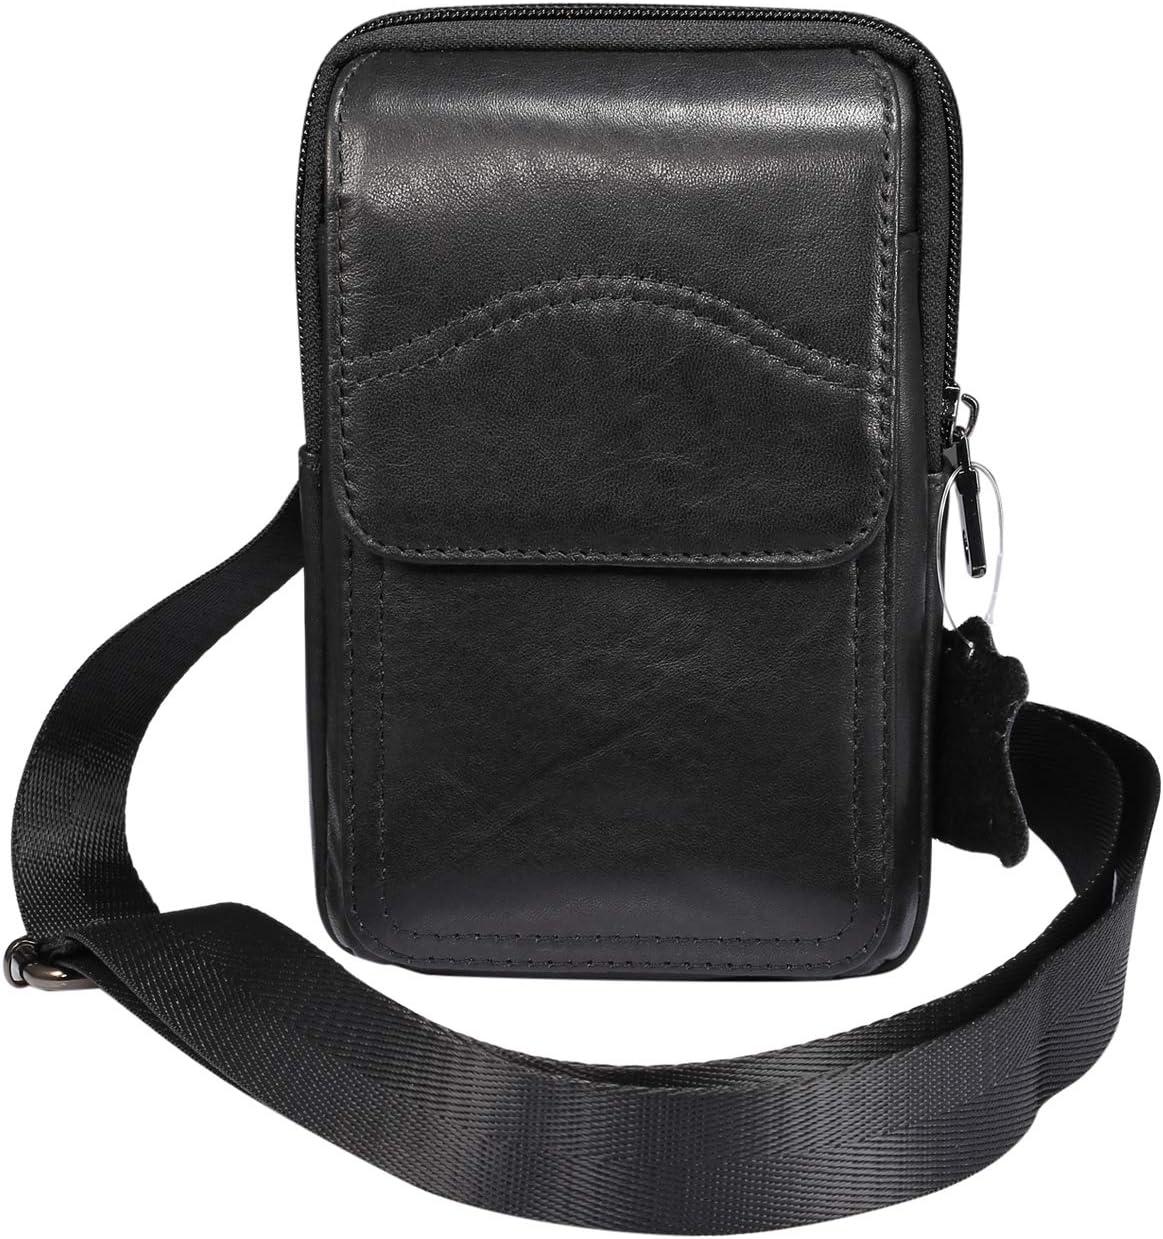 Genuine Leather Cell Phone Belt Holster Waist Bag Crossbody Purse Travel Bag for Galaxy S20+ S10 Plus,A30s,A10s,A50,Note9,Note 8, Google Pixel 4 XL,Xiaomi Mi 9T, Redmi 8A,OnePlus 7T,BLU Vivo XL5-Black